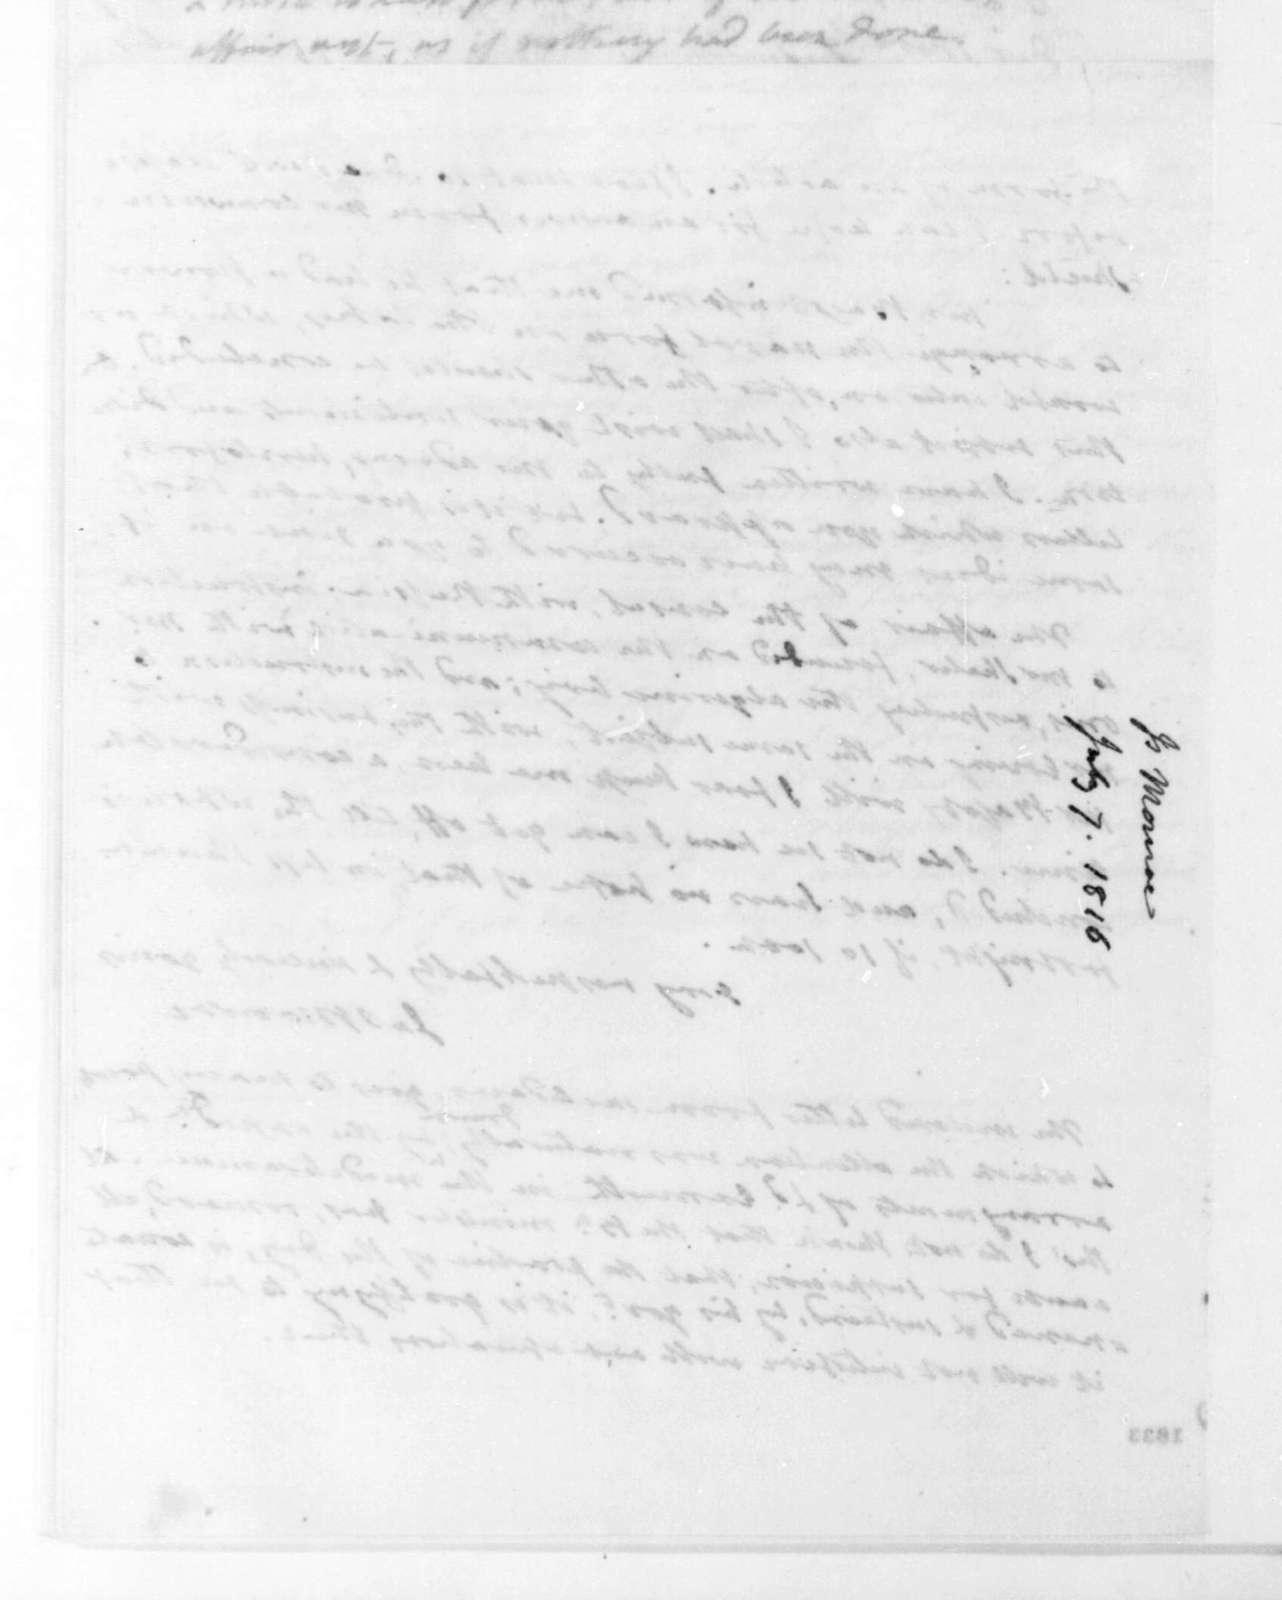 James Monroe to James Madison, July 7, 1816.